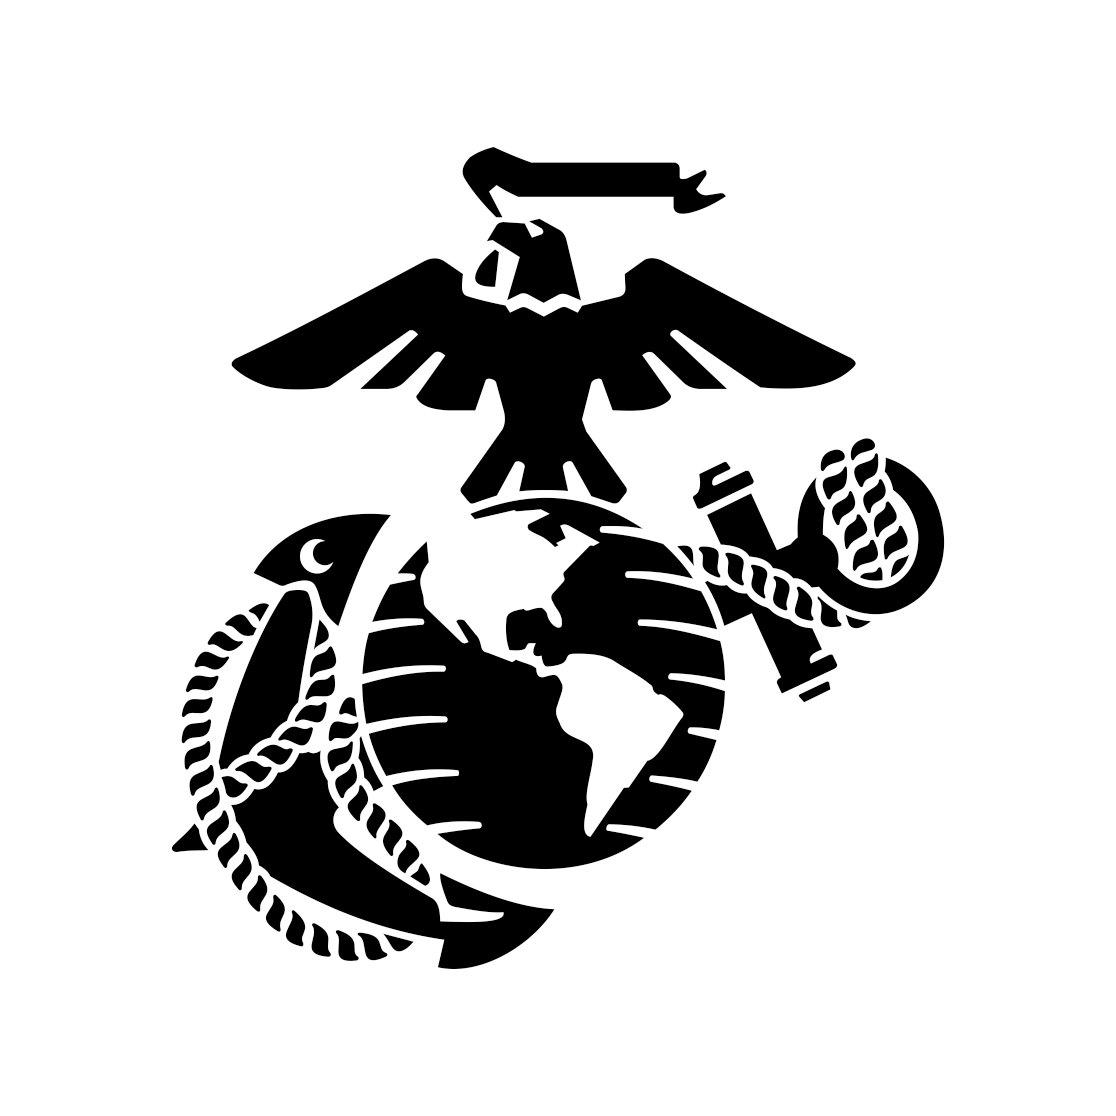 Eagle Globe Anchor Usmc Marine Corps Graphics By